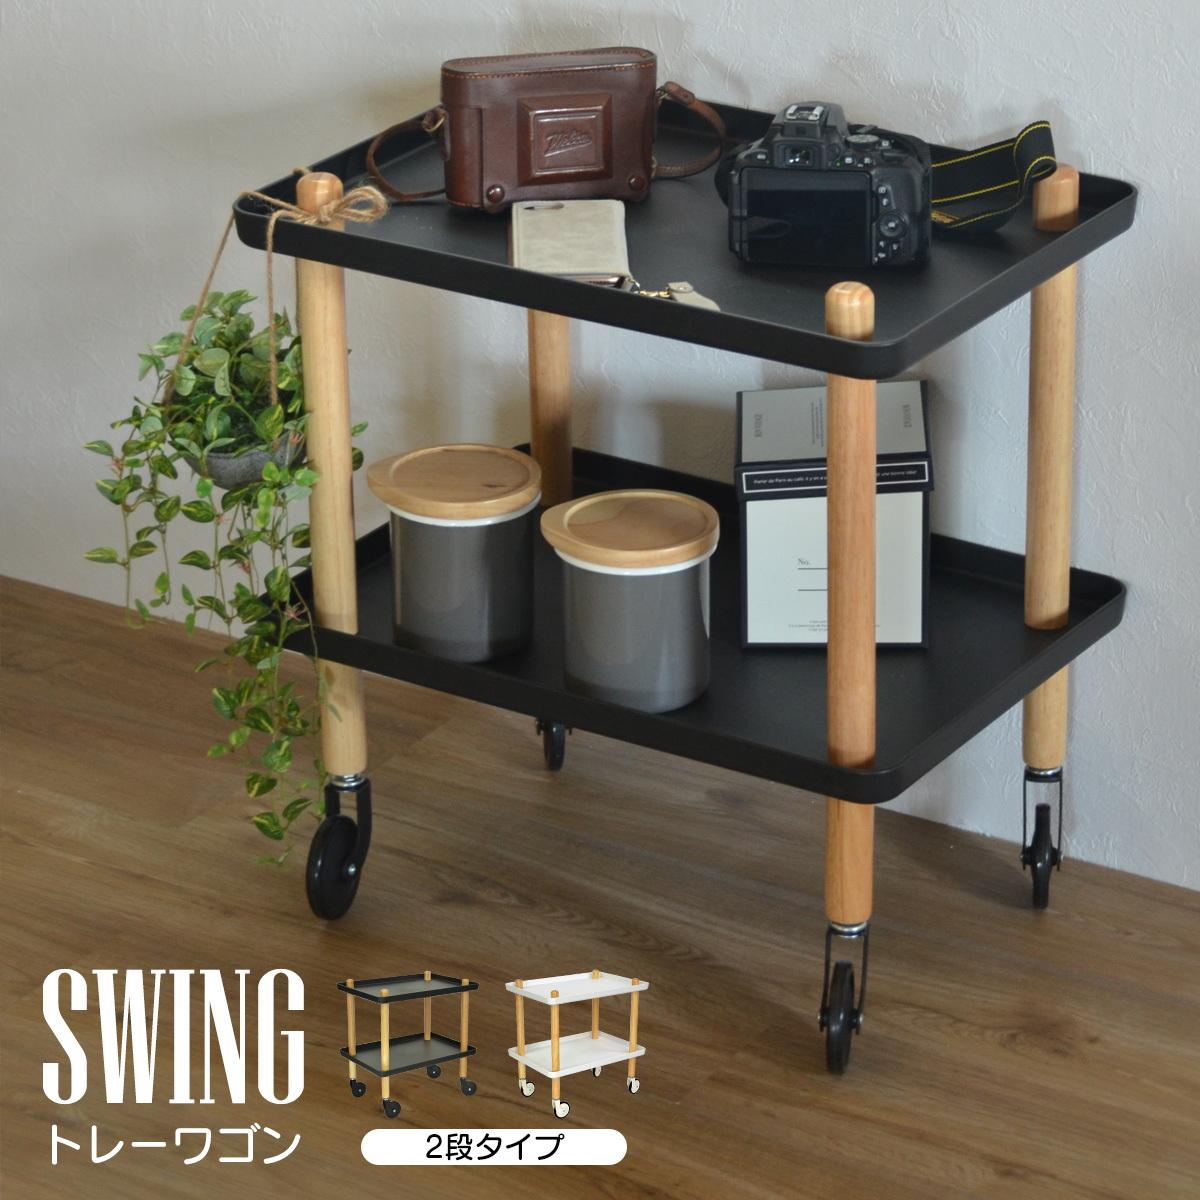 Swing Wagon 2tray / スウィングワゴン 2段トレー